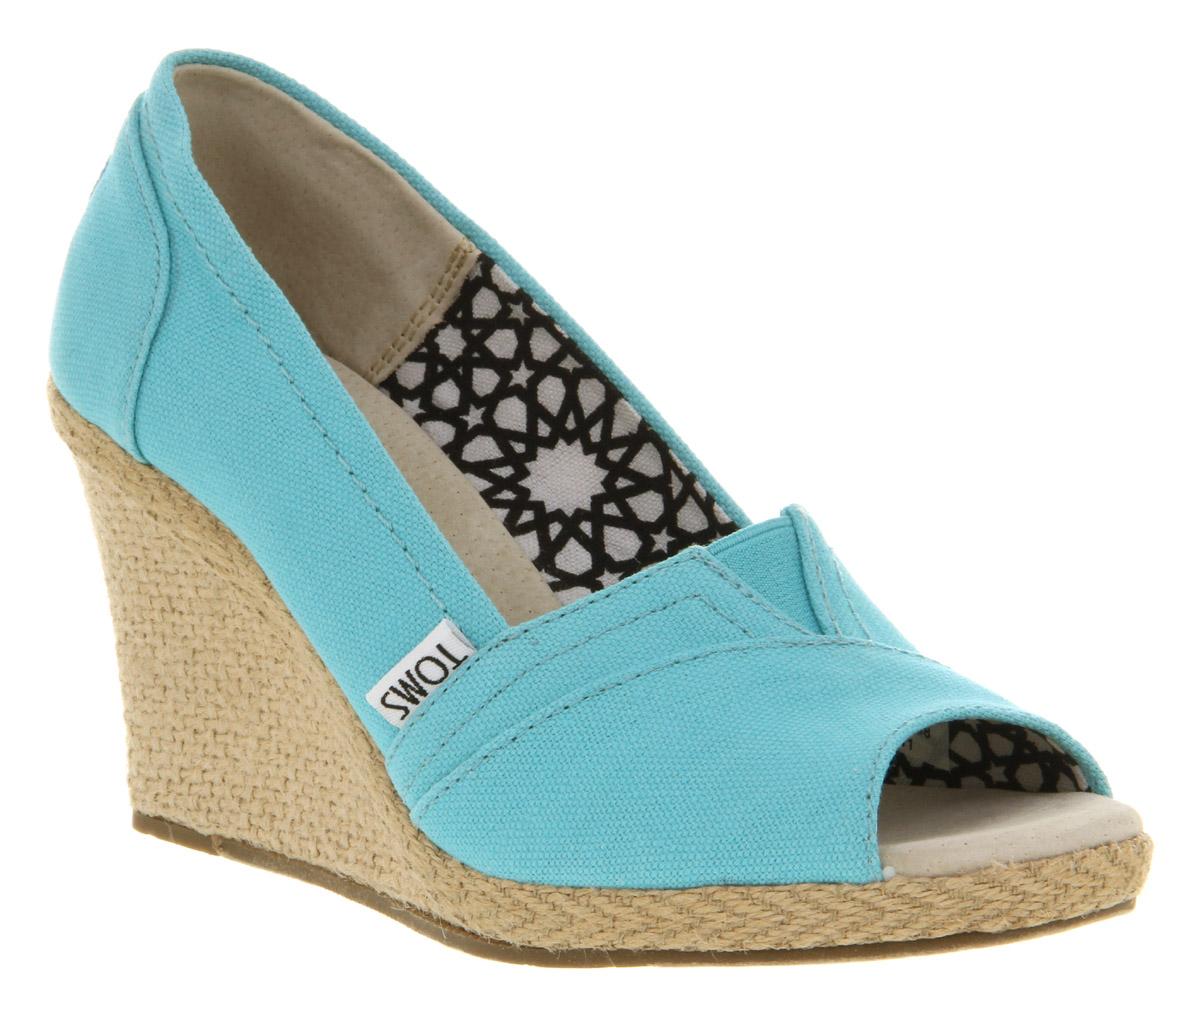 womens toms wedge peeptoe aqua canvas heels shoes ebay